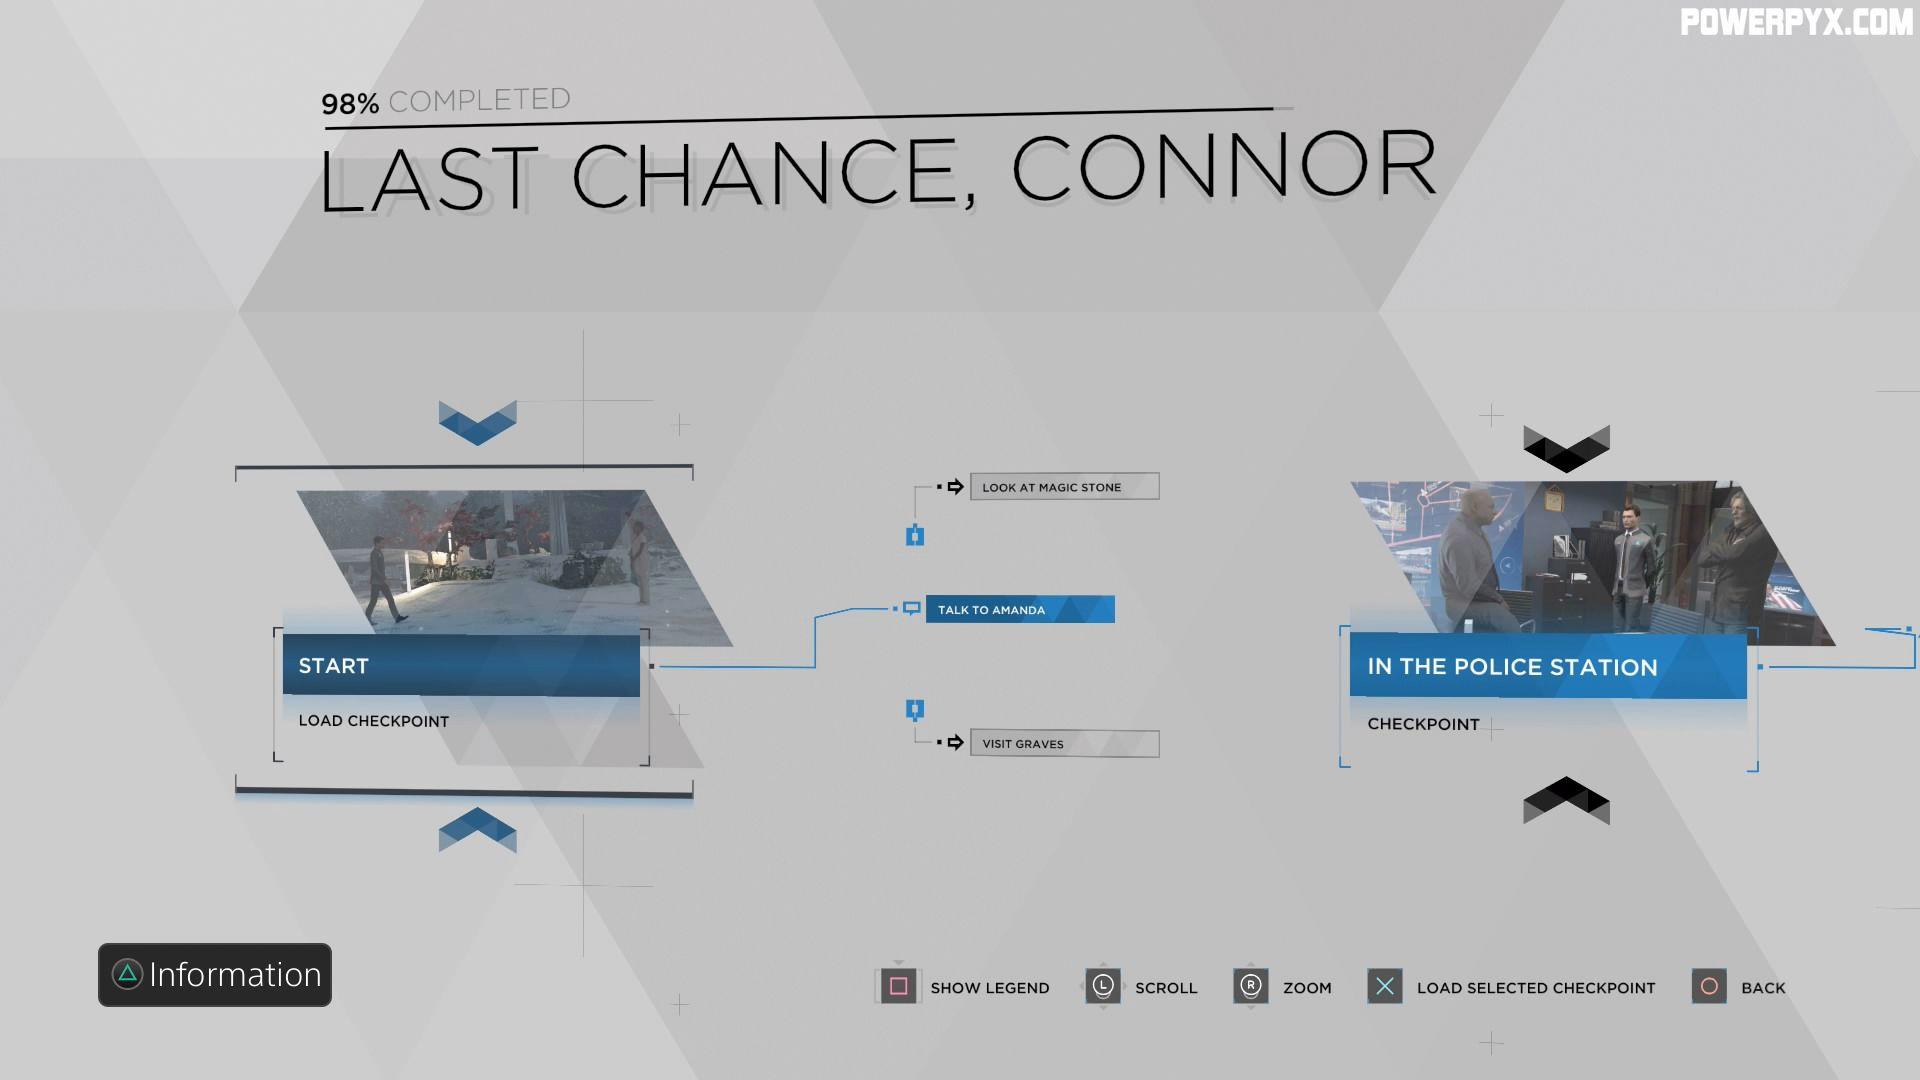 Detroit Become Human: Last Chance, Connor Walkthrough 100%